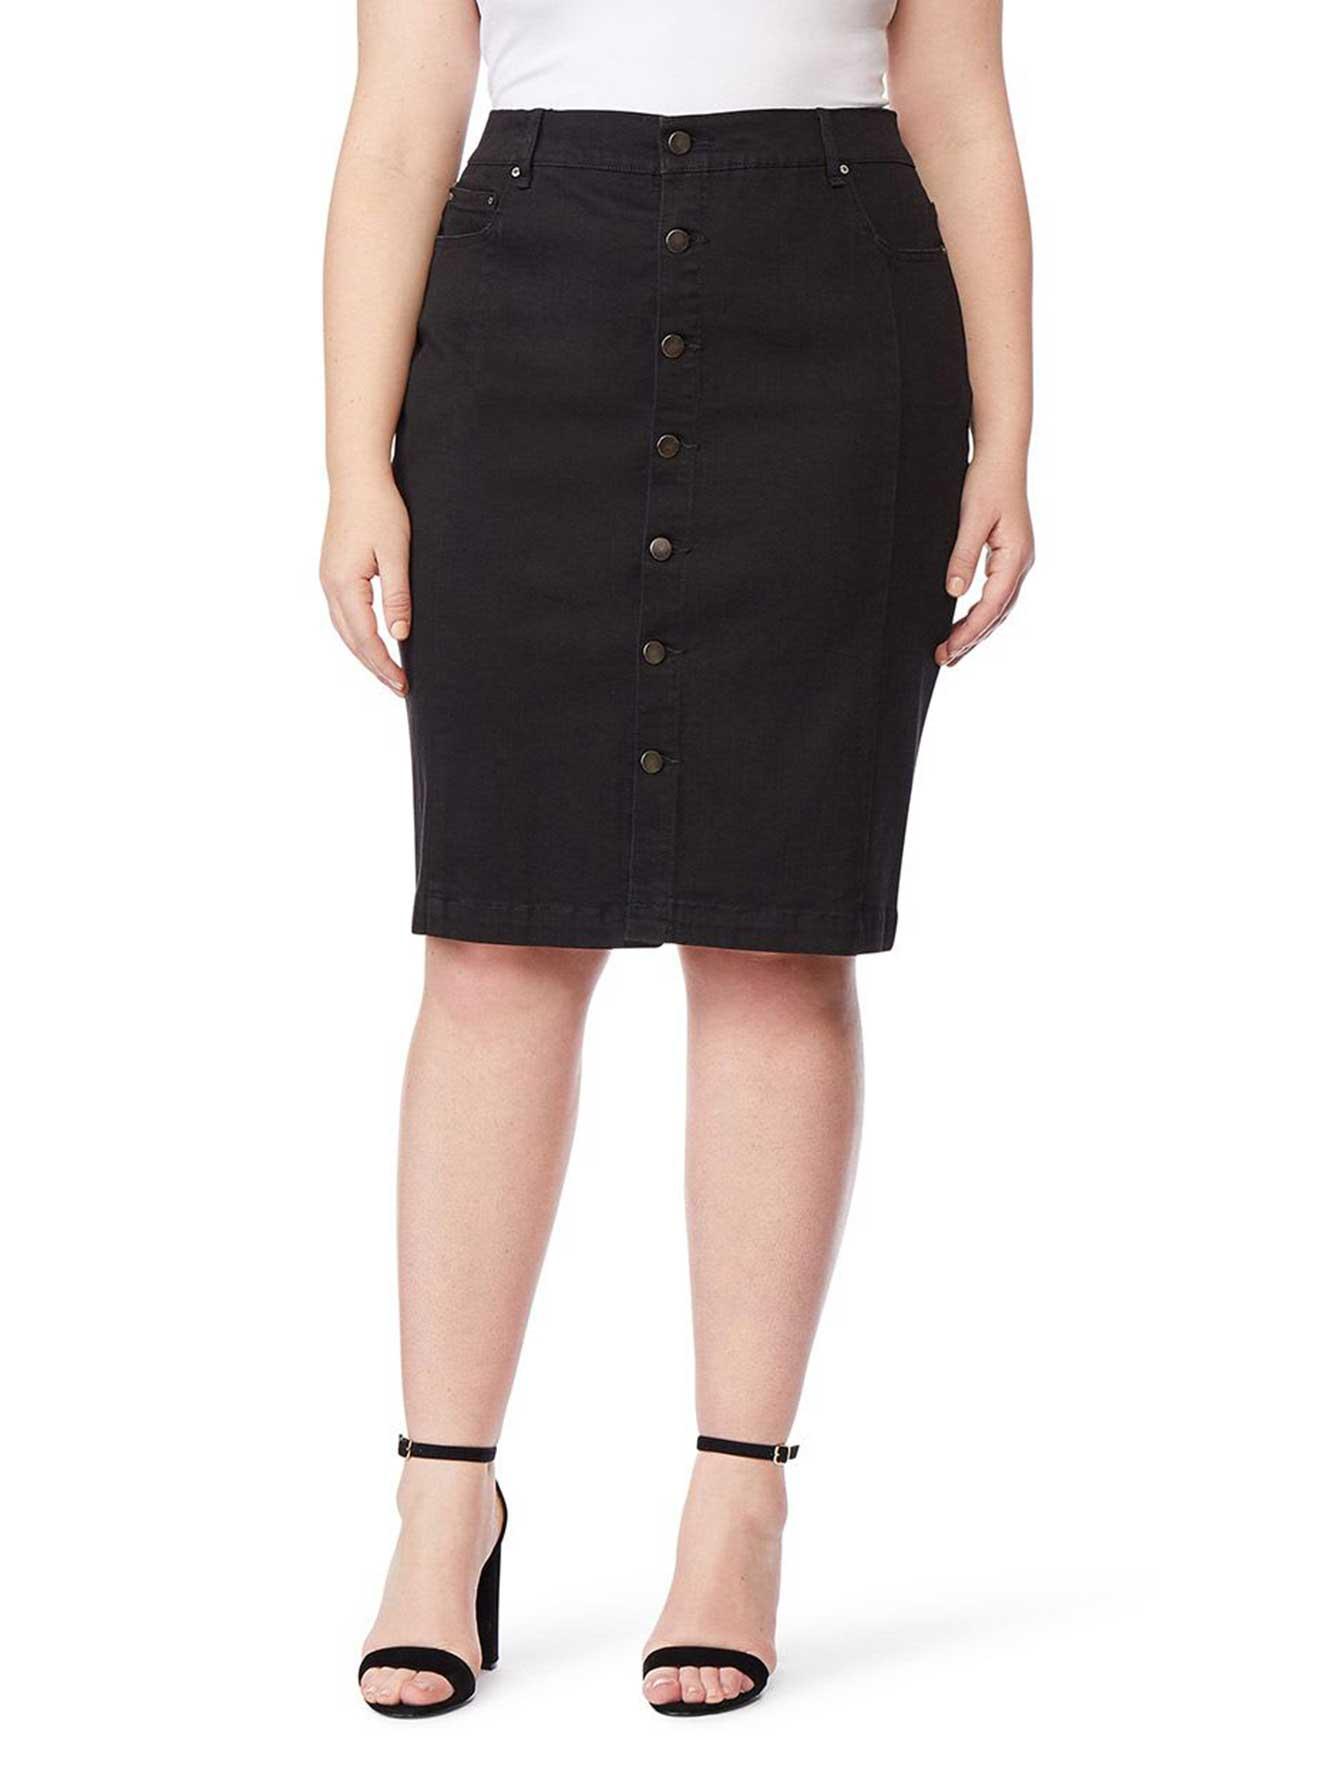 a46ba8c33c Black Denim Skirt - Rebel Wilson | Addition Elle